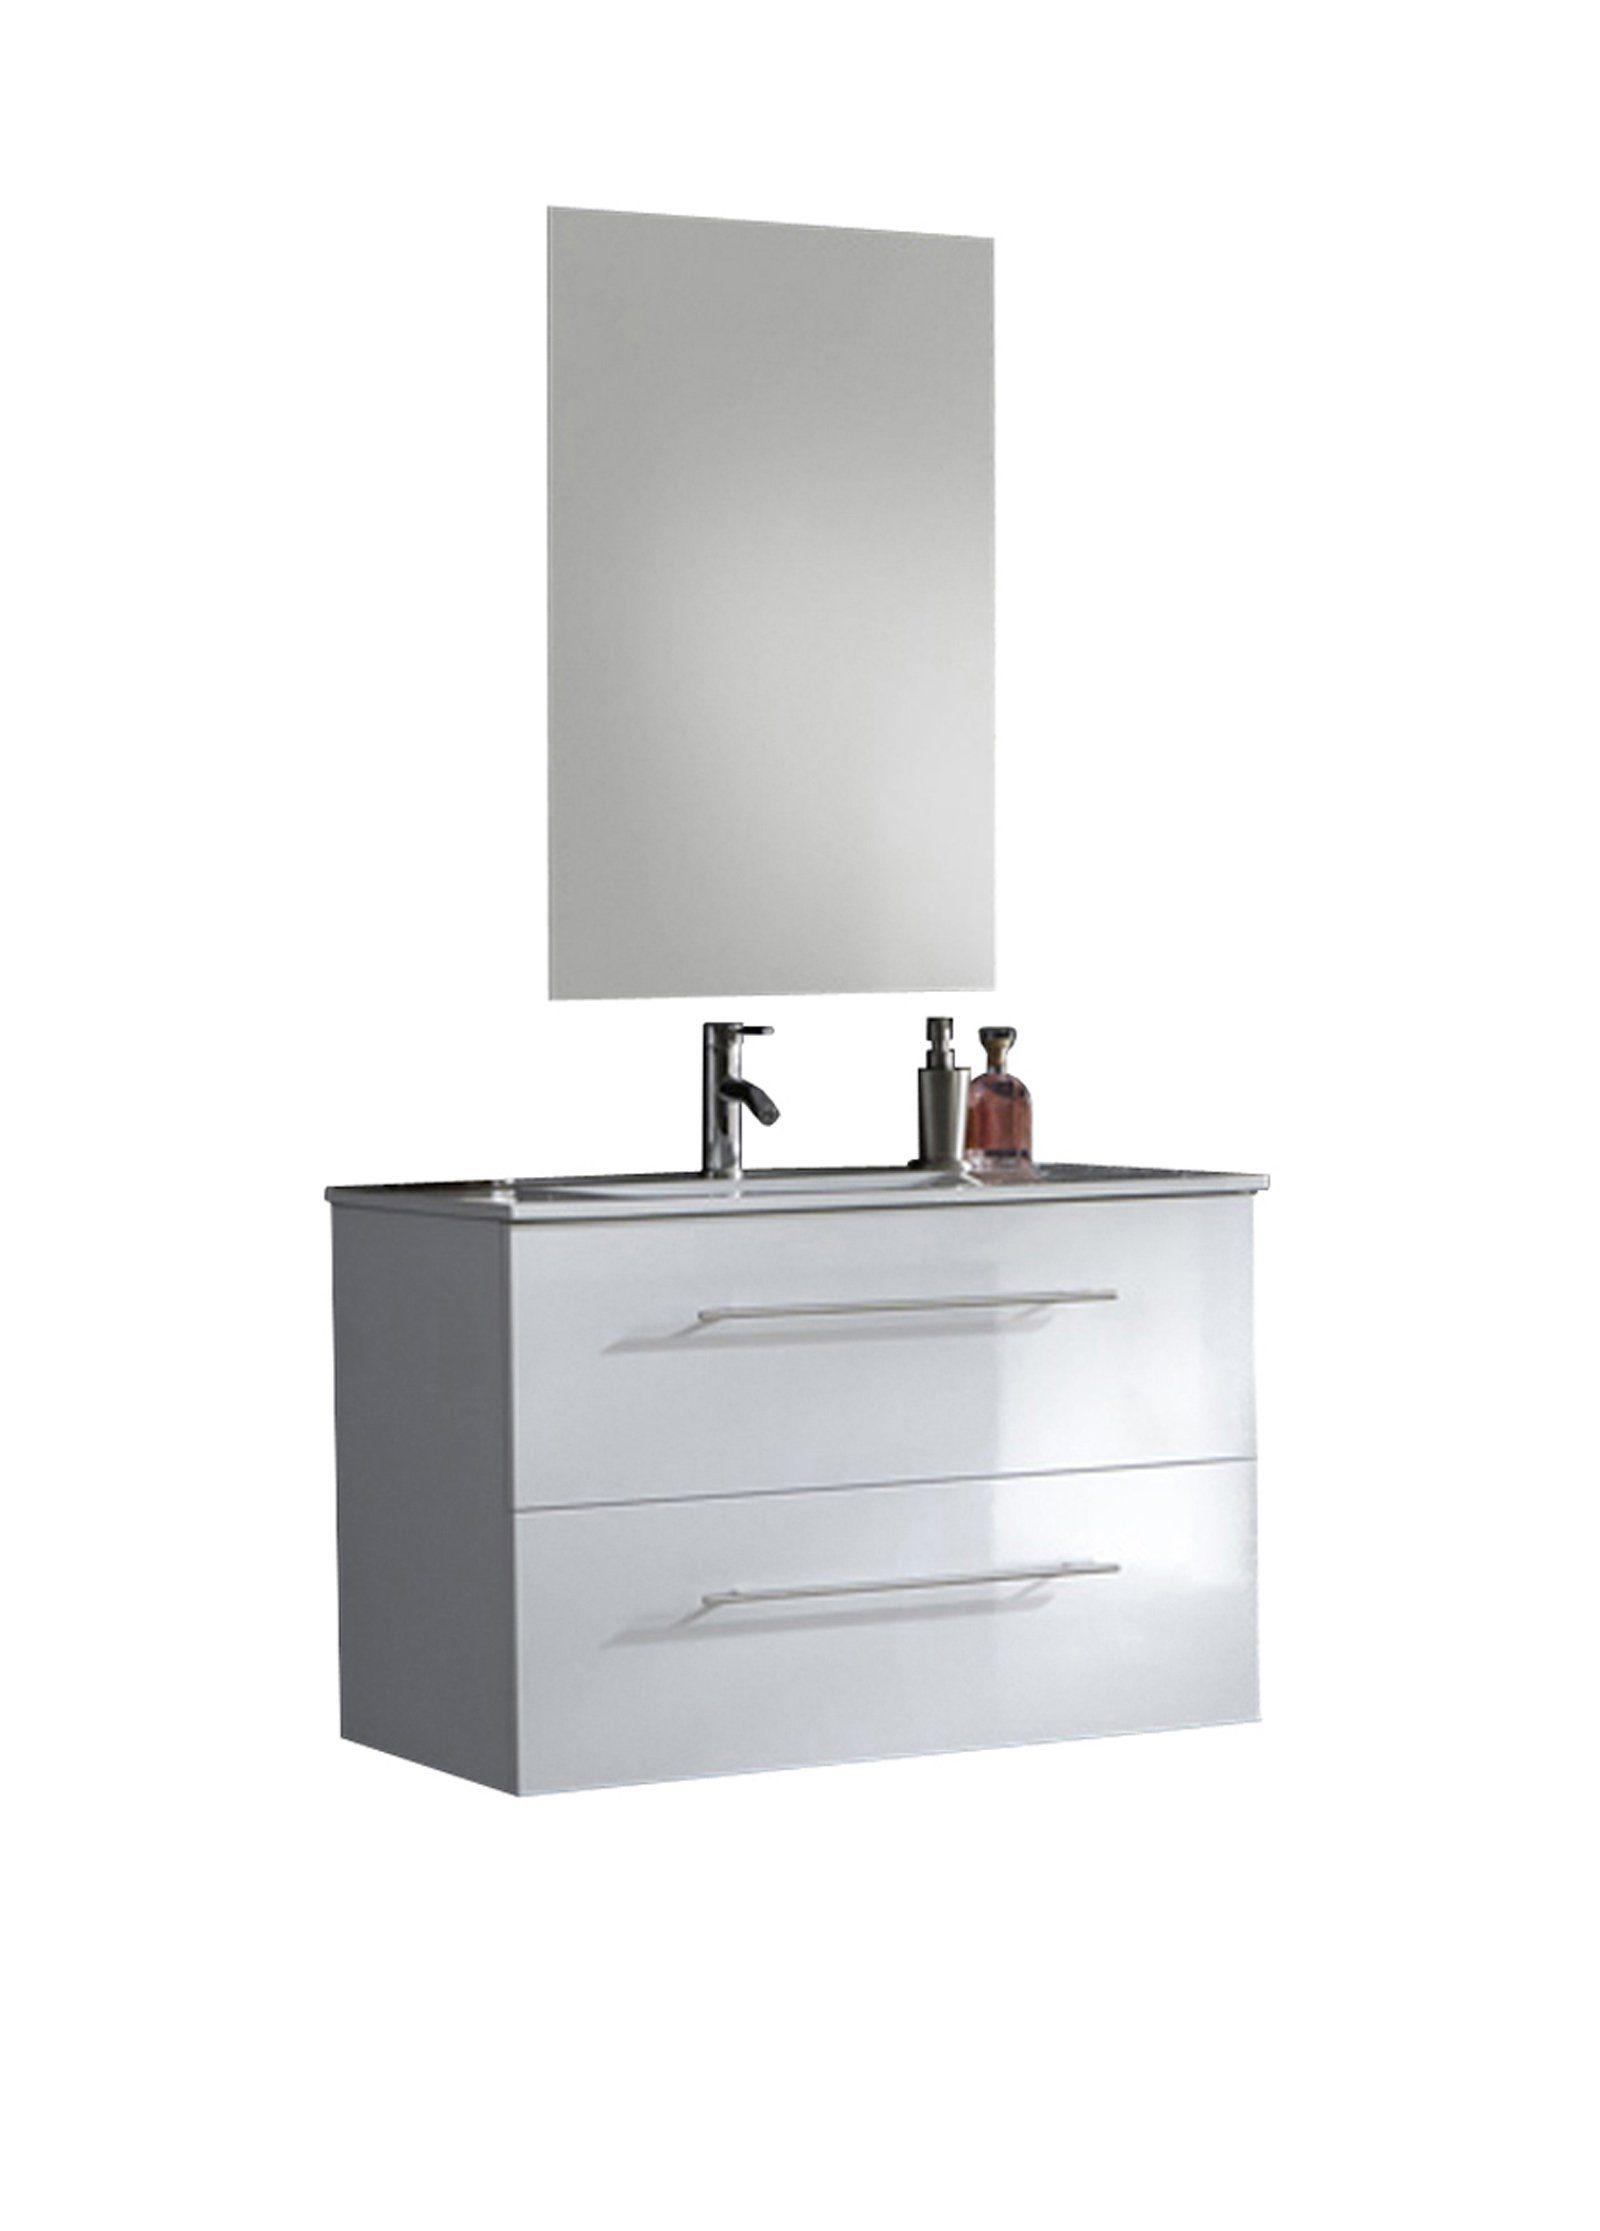 SalesFever Badmöbel-Set, Breite 90 cm (2-tlg.) Light »Basia«